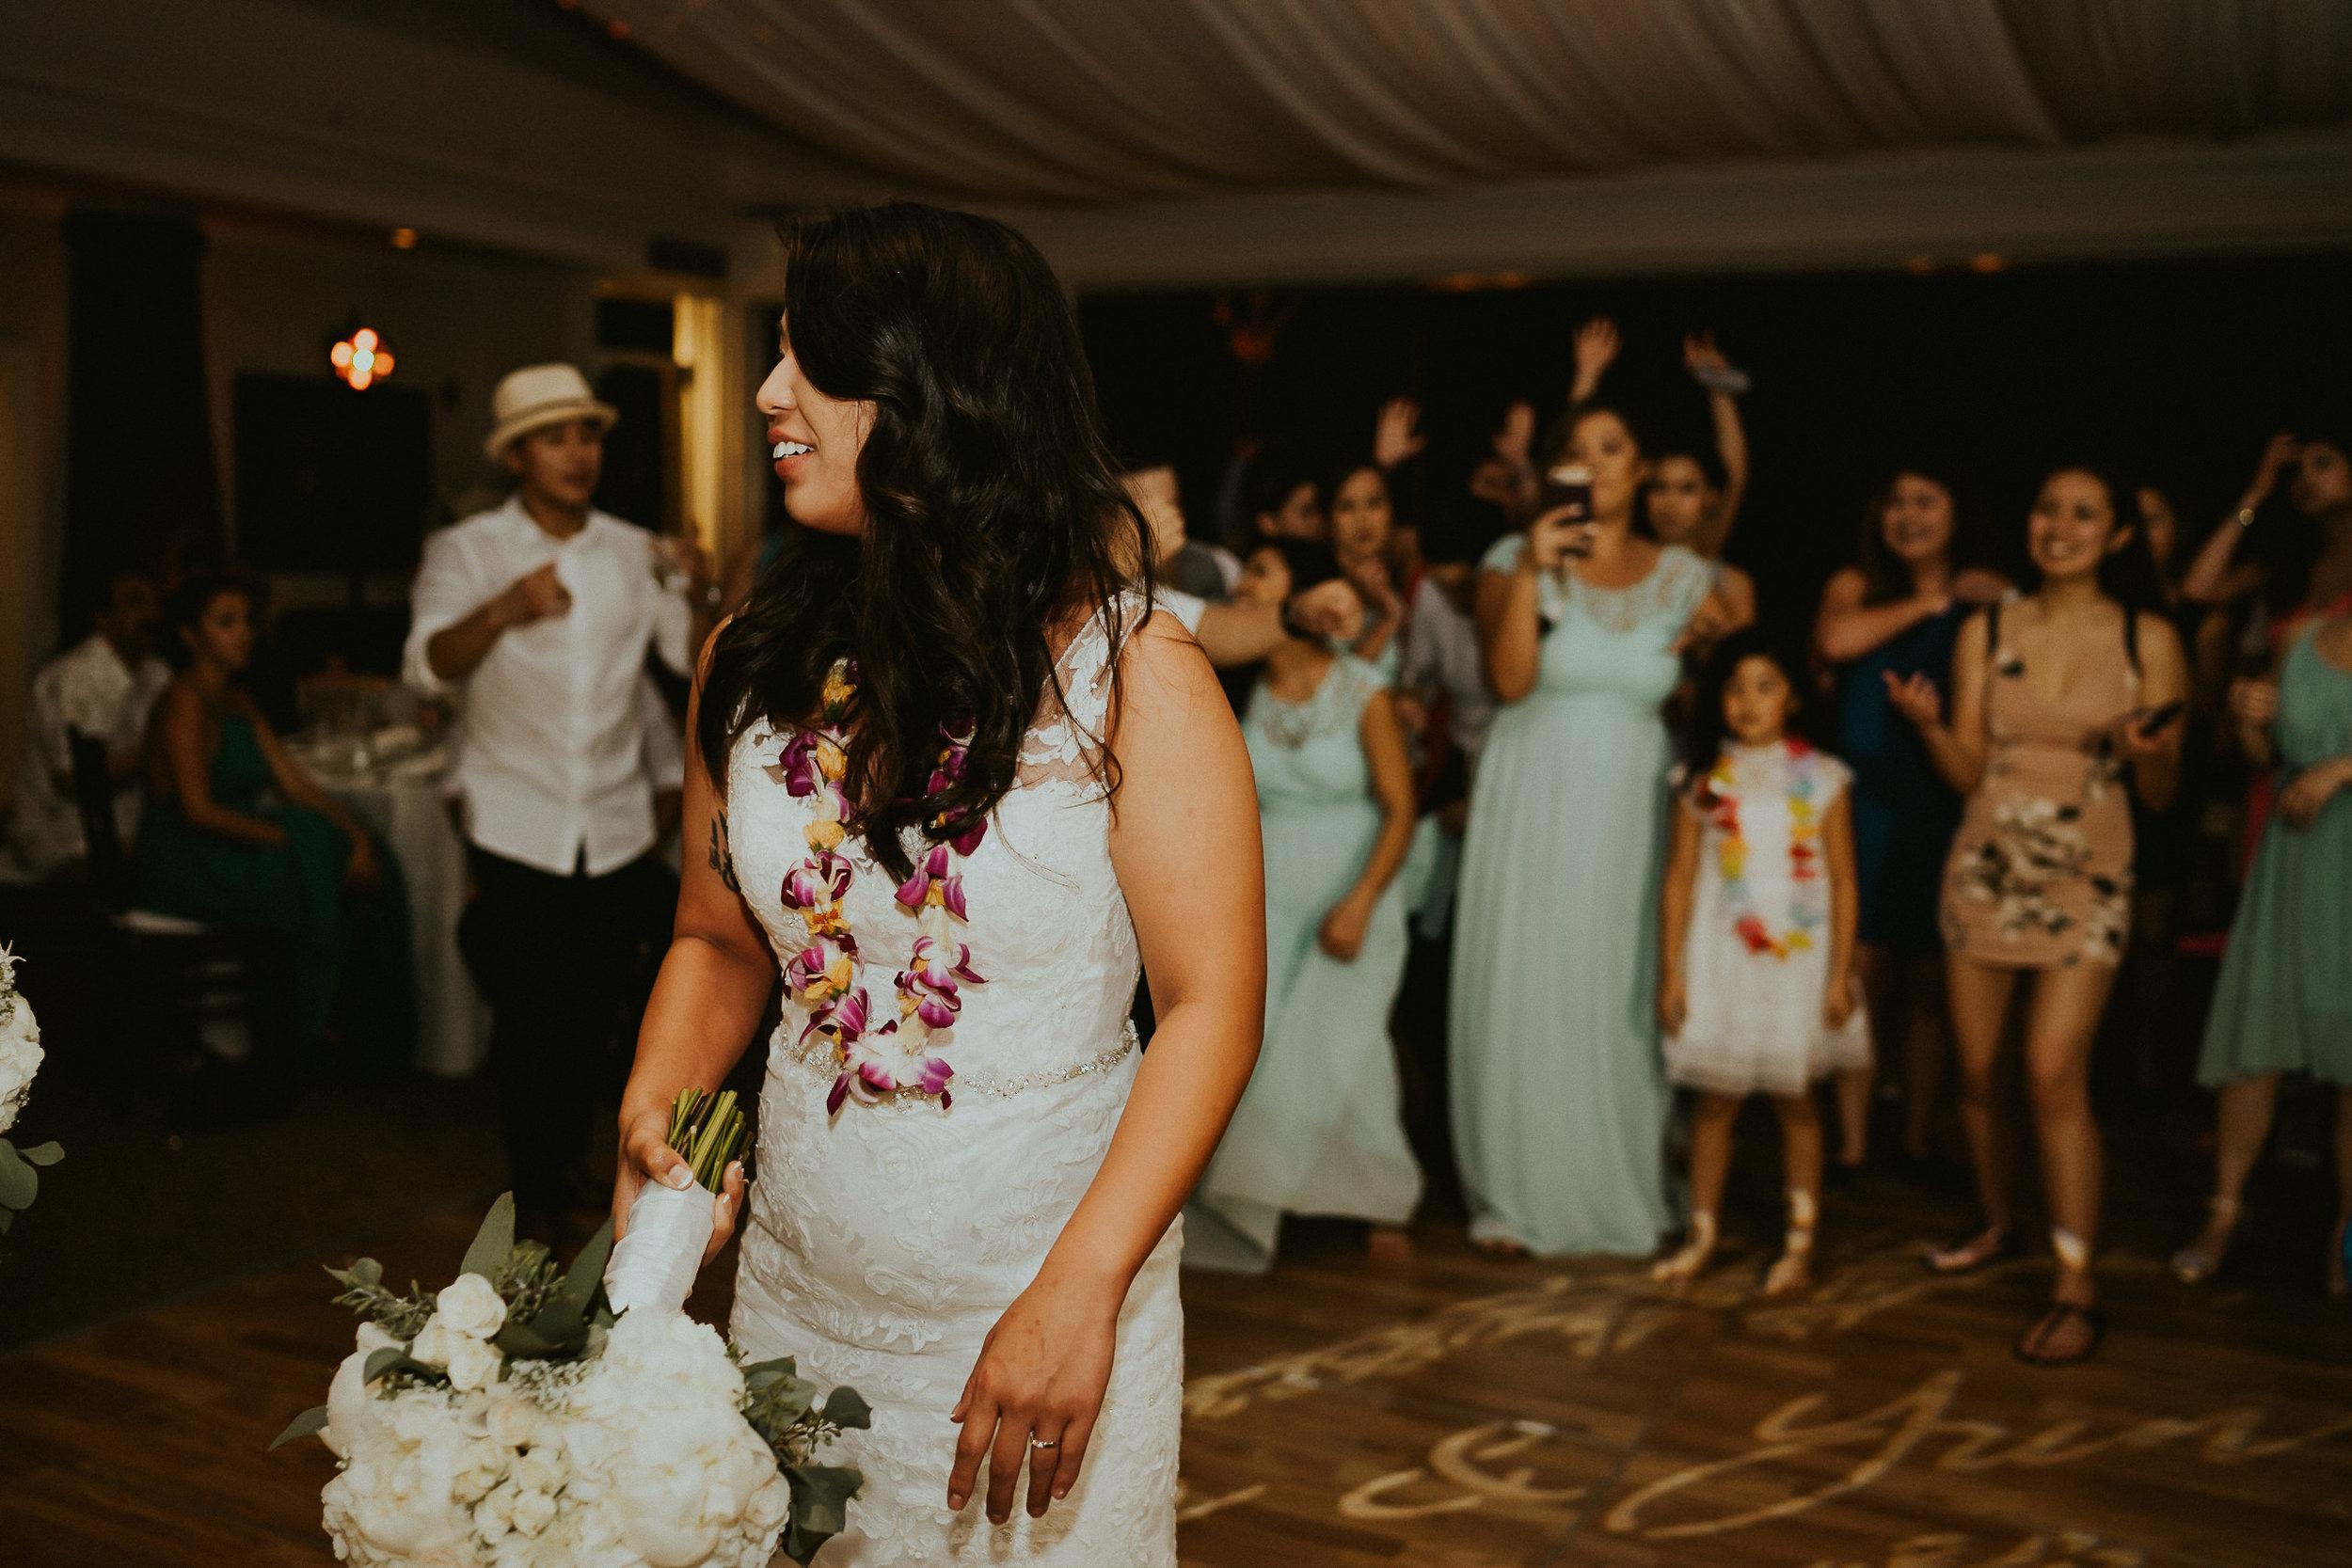 Maui_Destination_wedding_Alfred_Tang-99.jpg